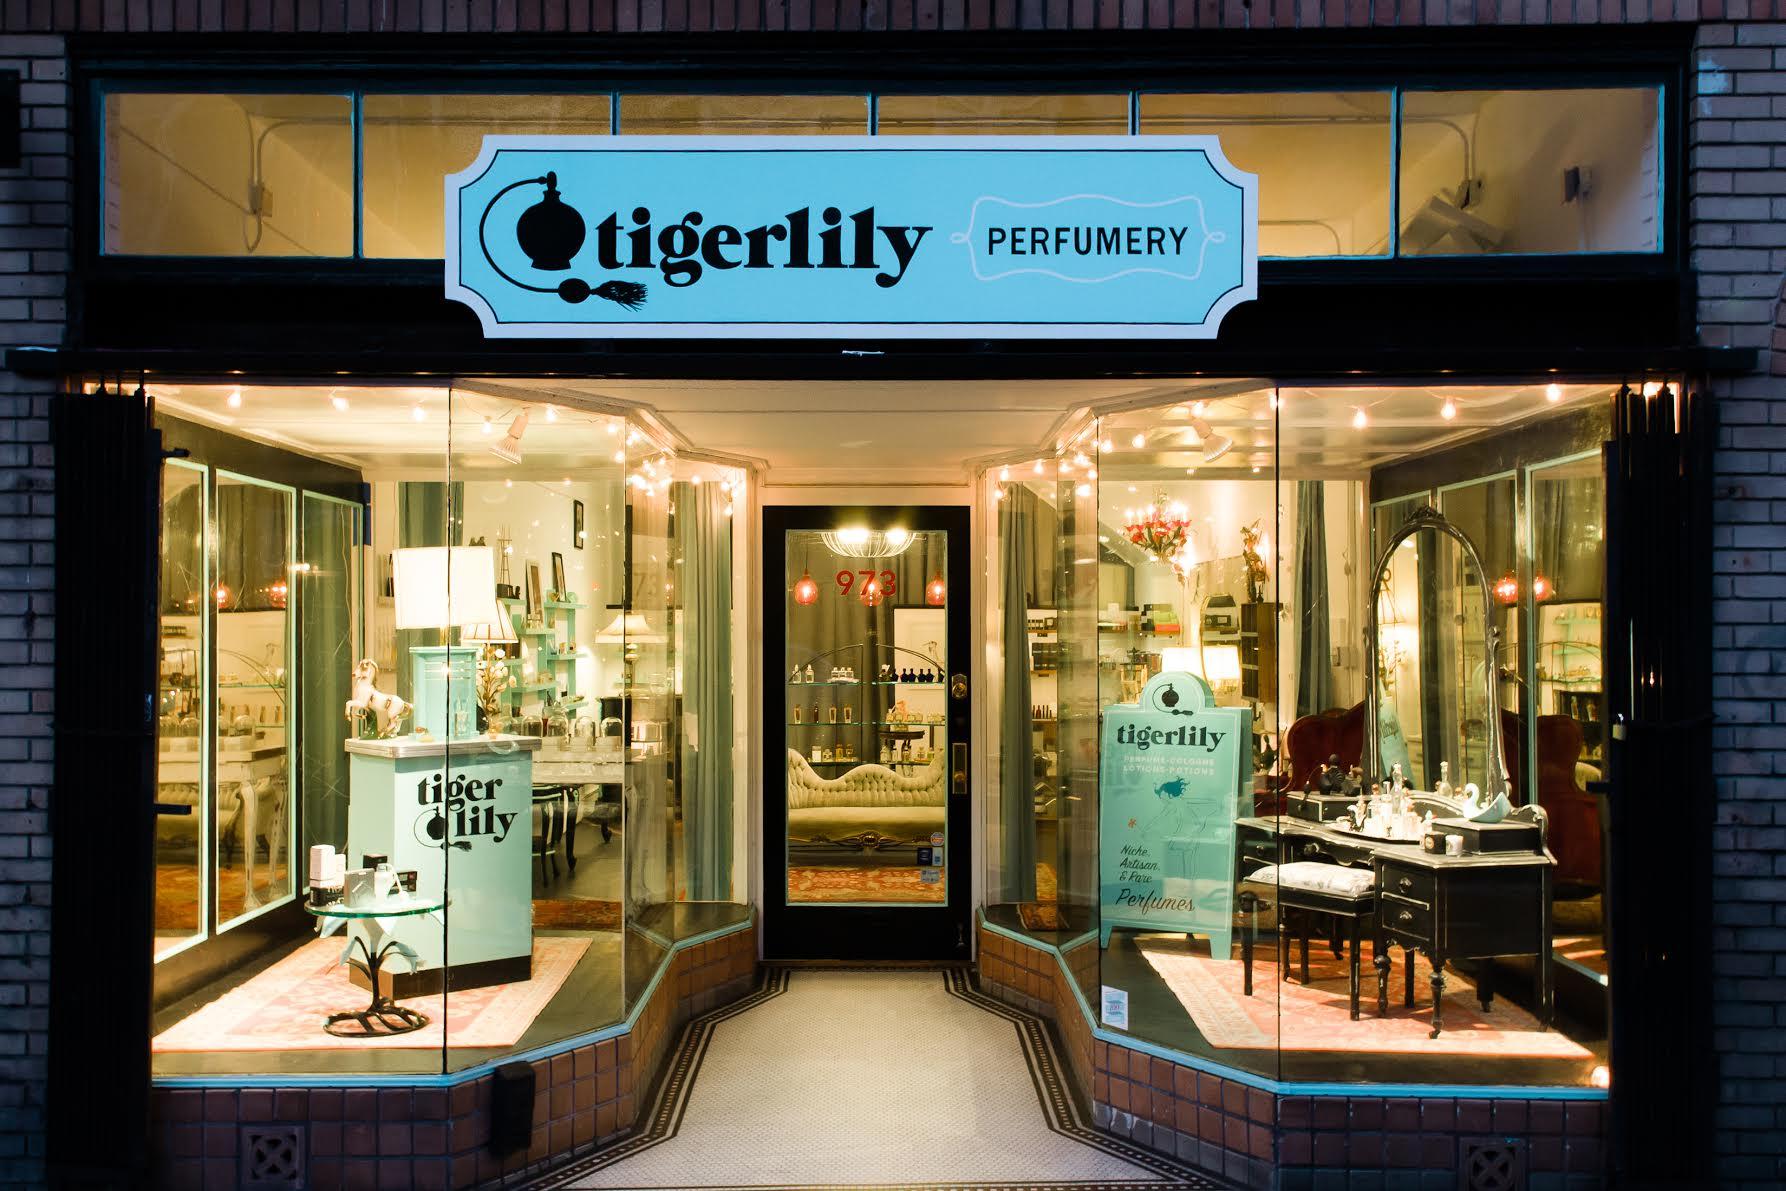 Exterior Store of Tigerlily; Image Courtesy of Tigerilly Perfumery